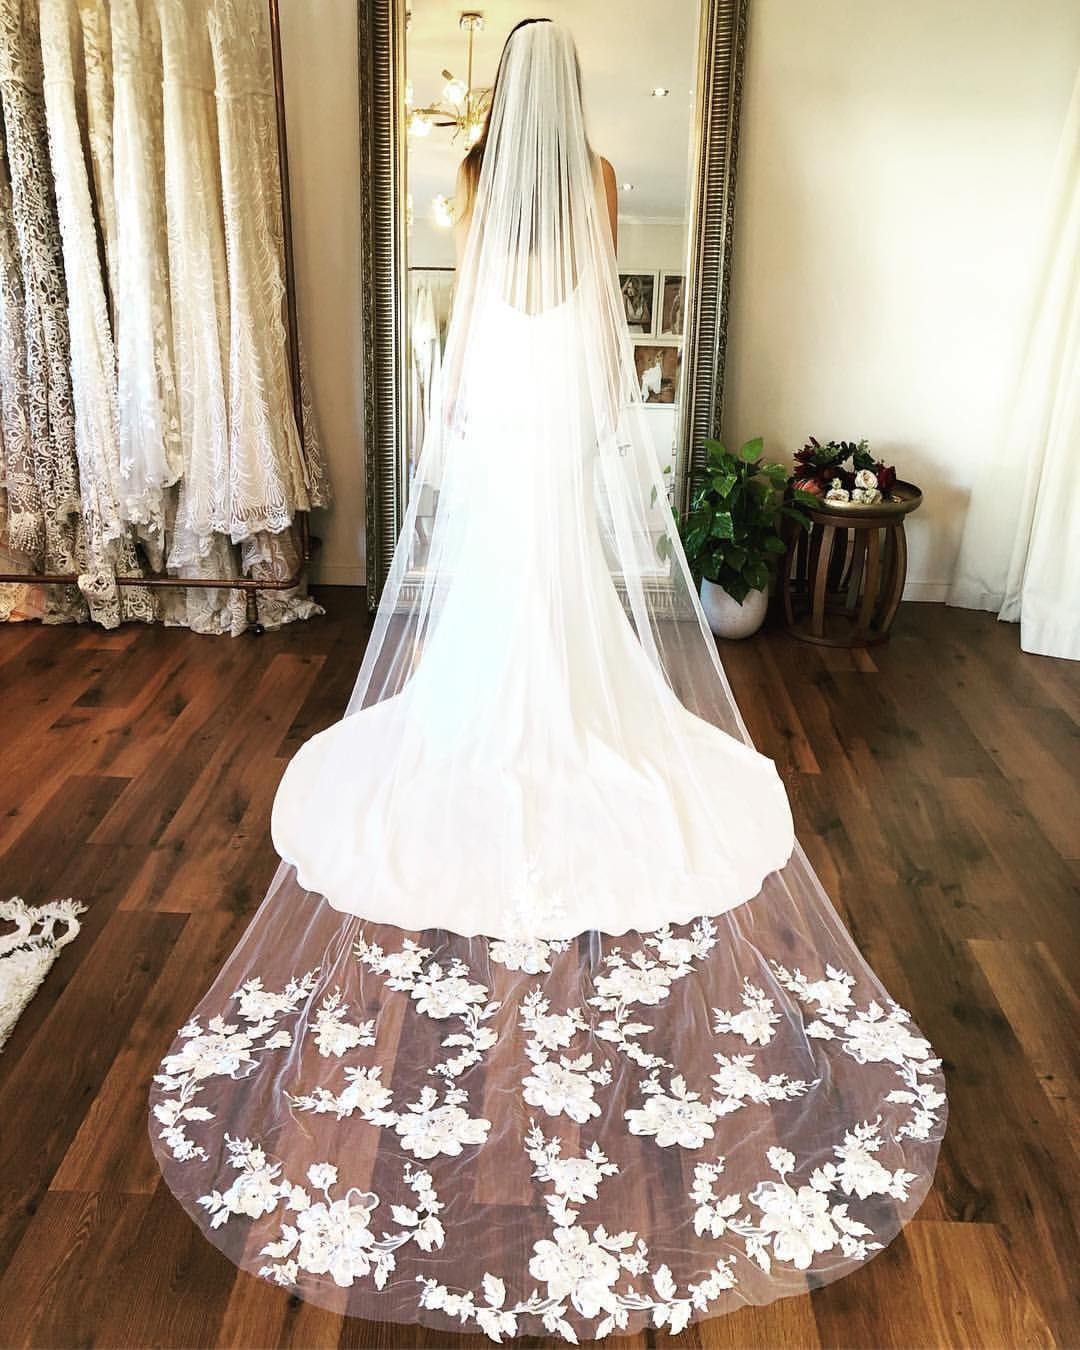 Veil Goals Repost Madewithlovebridal Done Deal Stevie Veil With Our Georgie In Fr Embellished Wedding Dress Affordable Wedding Dresses Wedding Dresses